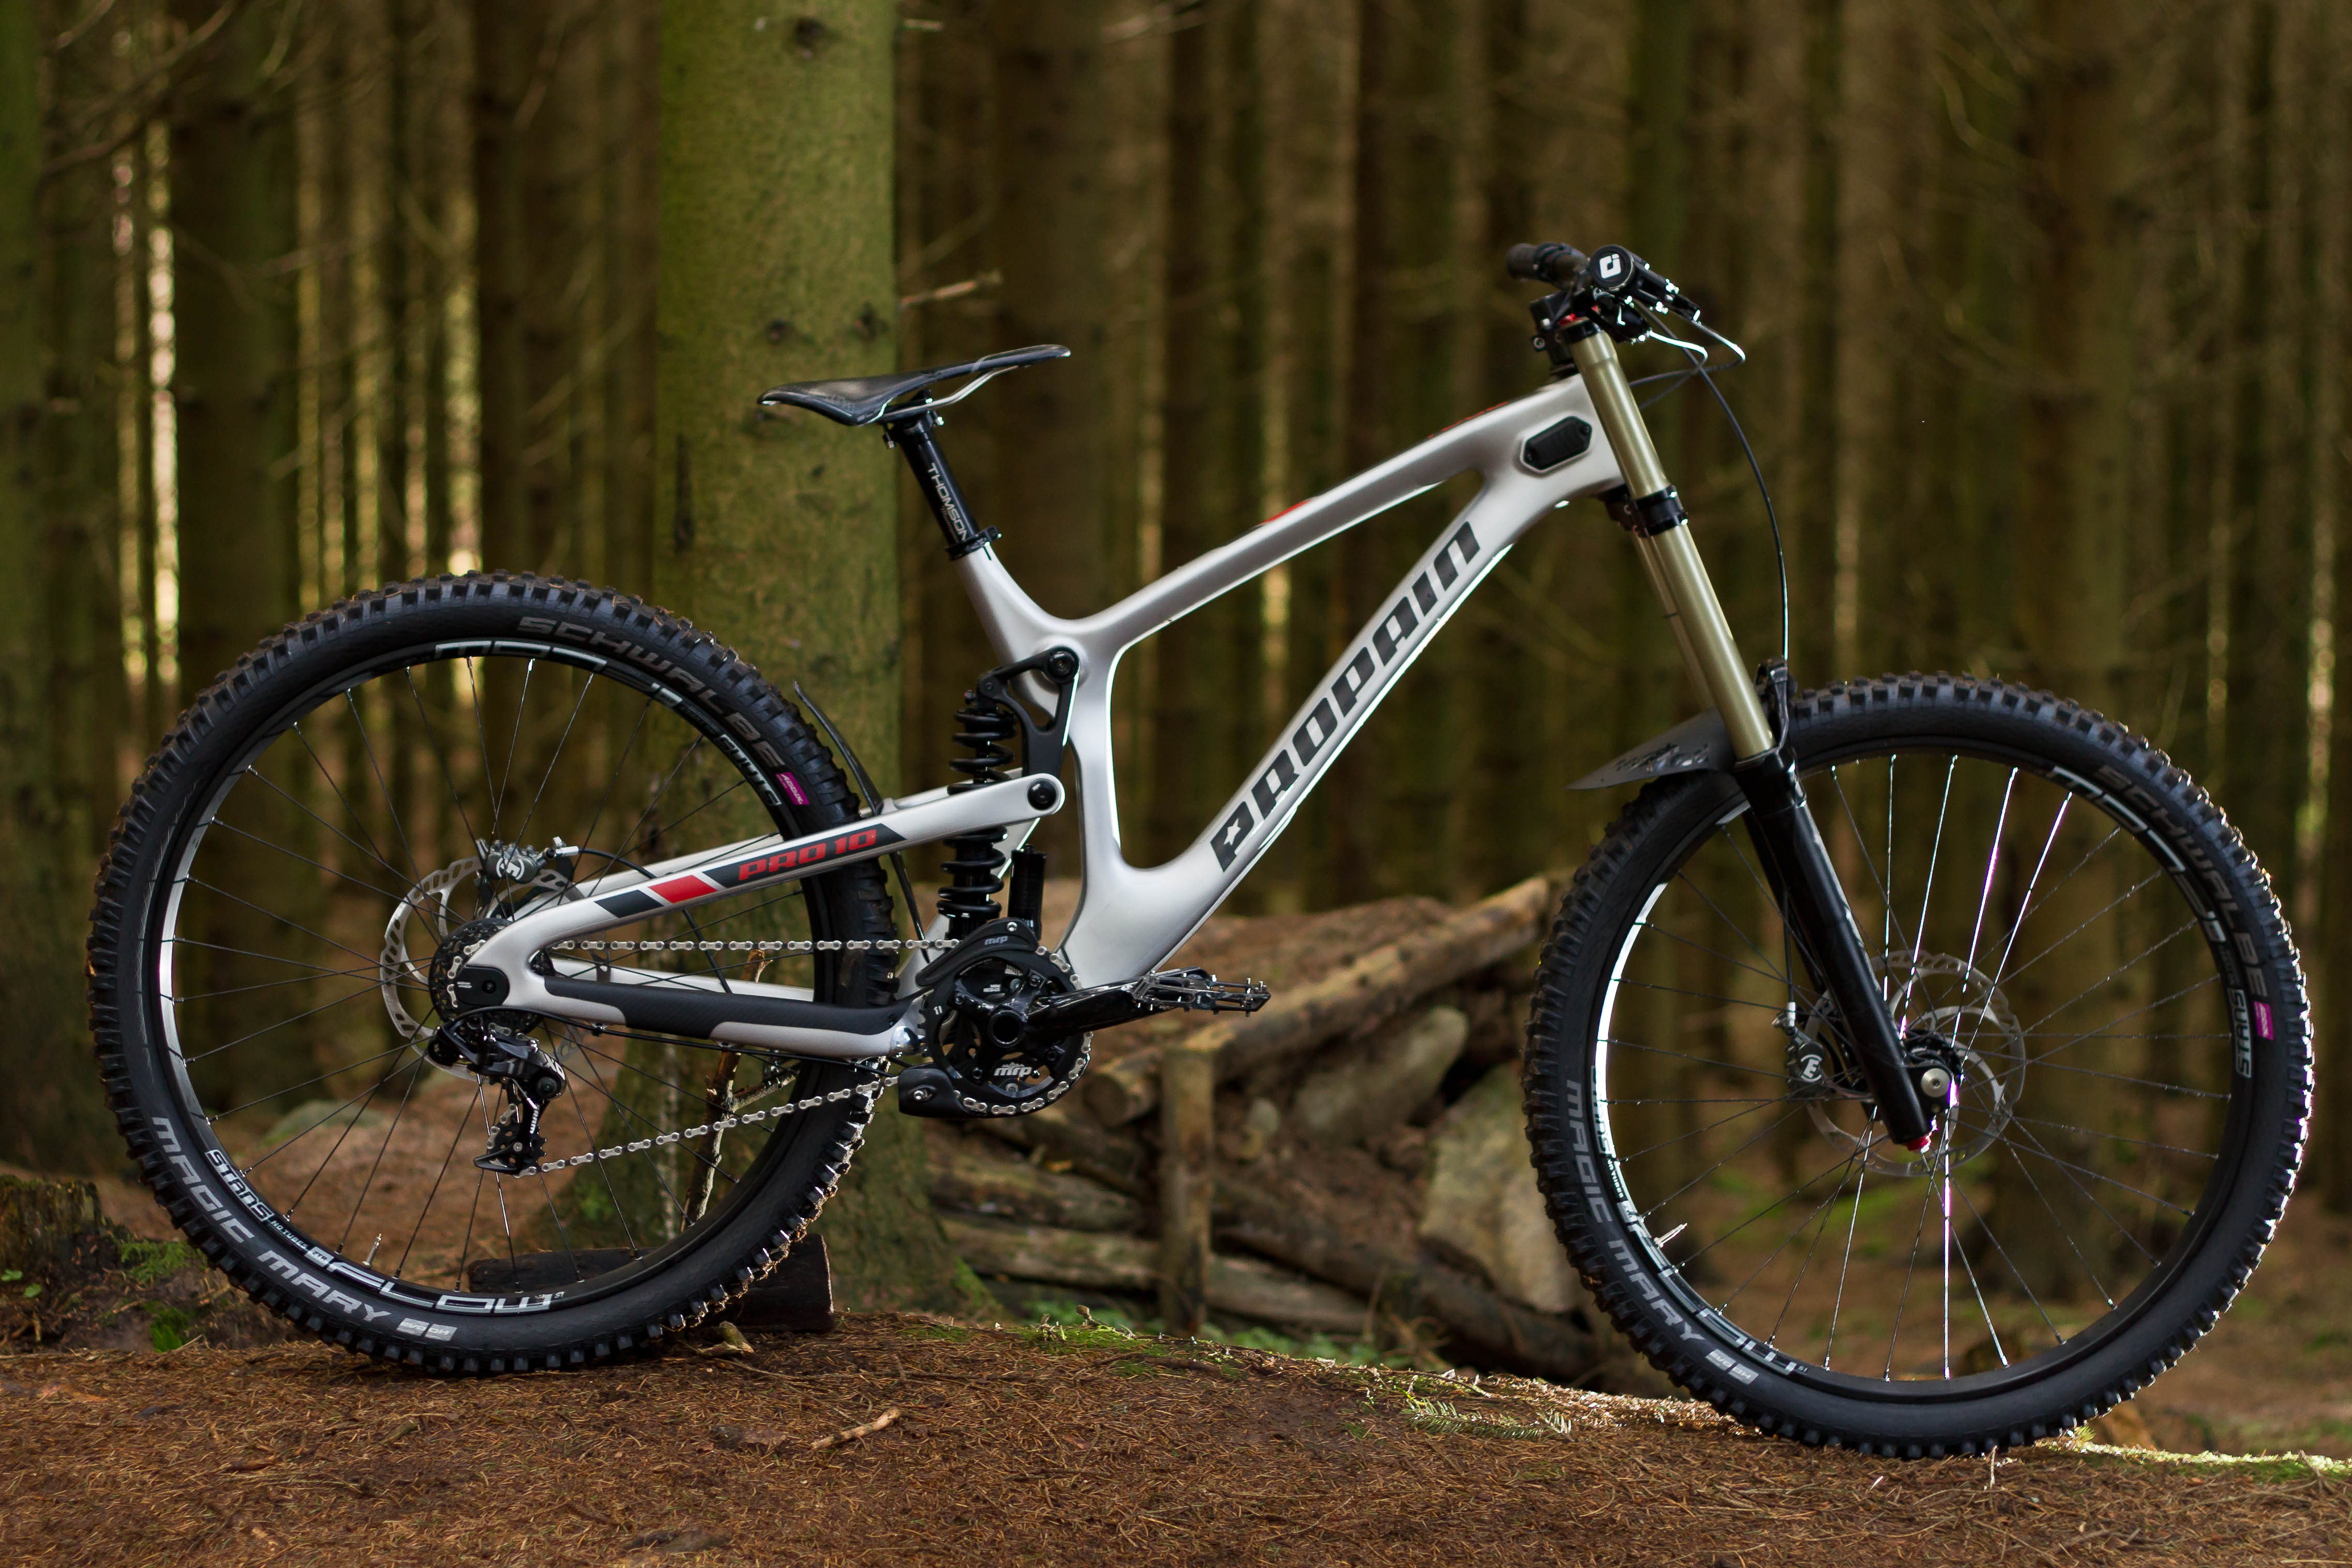 PROPAIN Rage 2013 - retrospecss Bike Check - Vital MTB